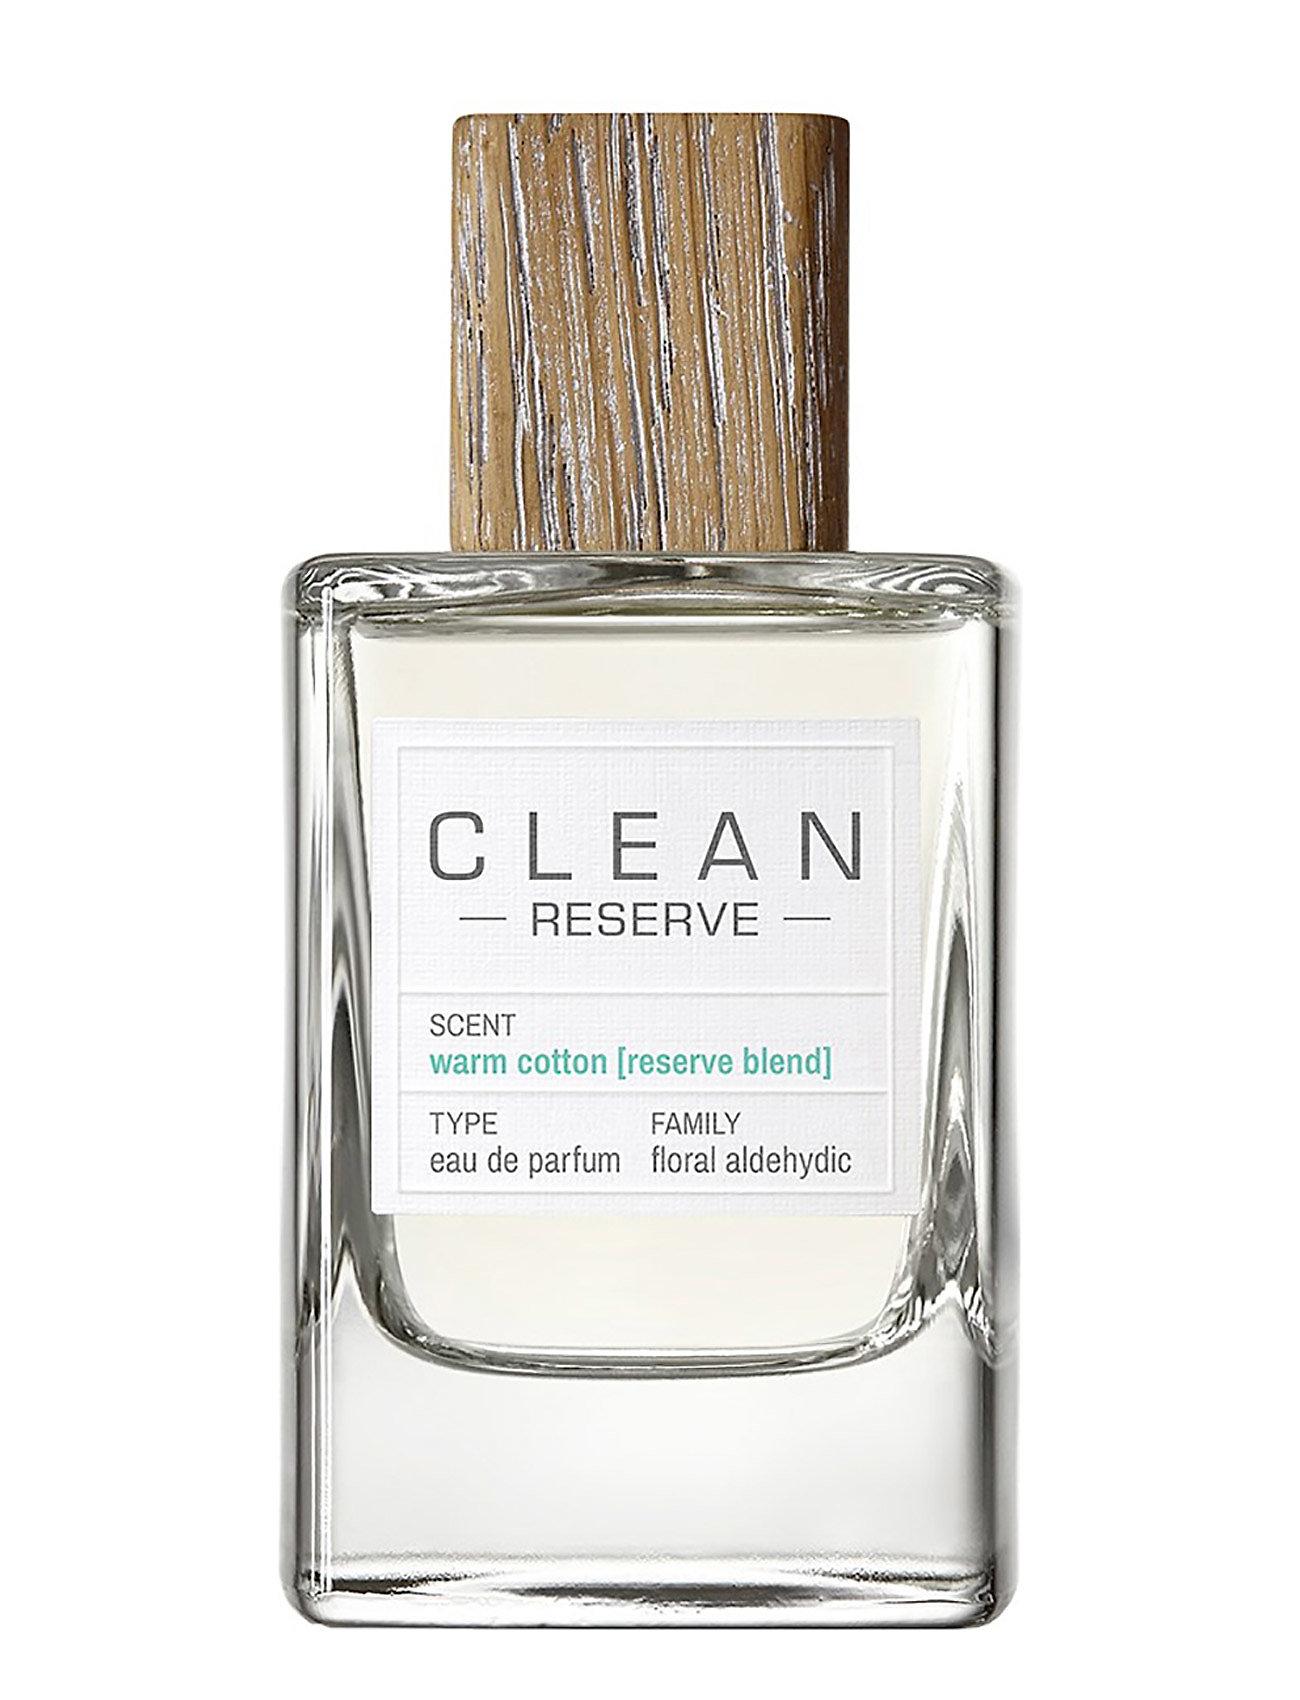 clean reserve – Clean reserve blends warm cotton fra boozt.com dk